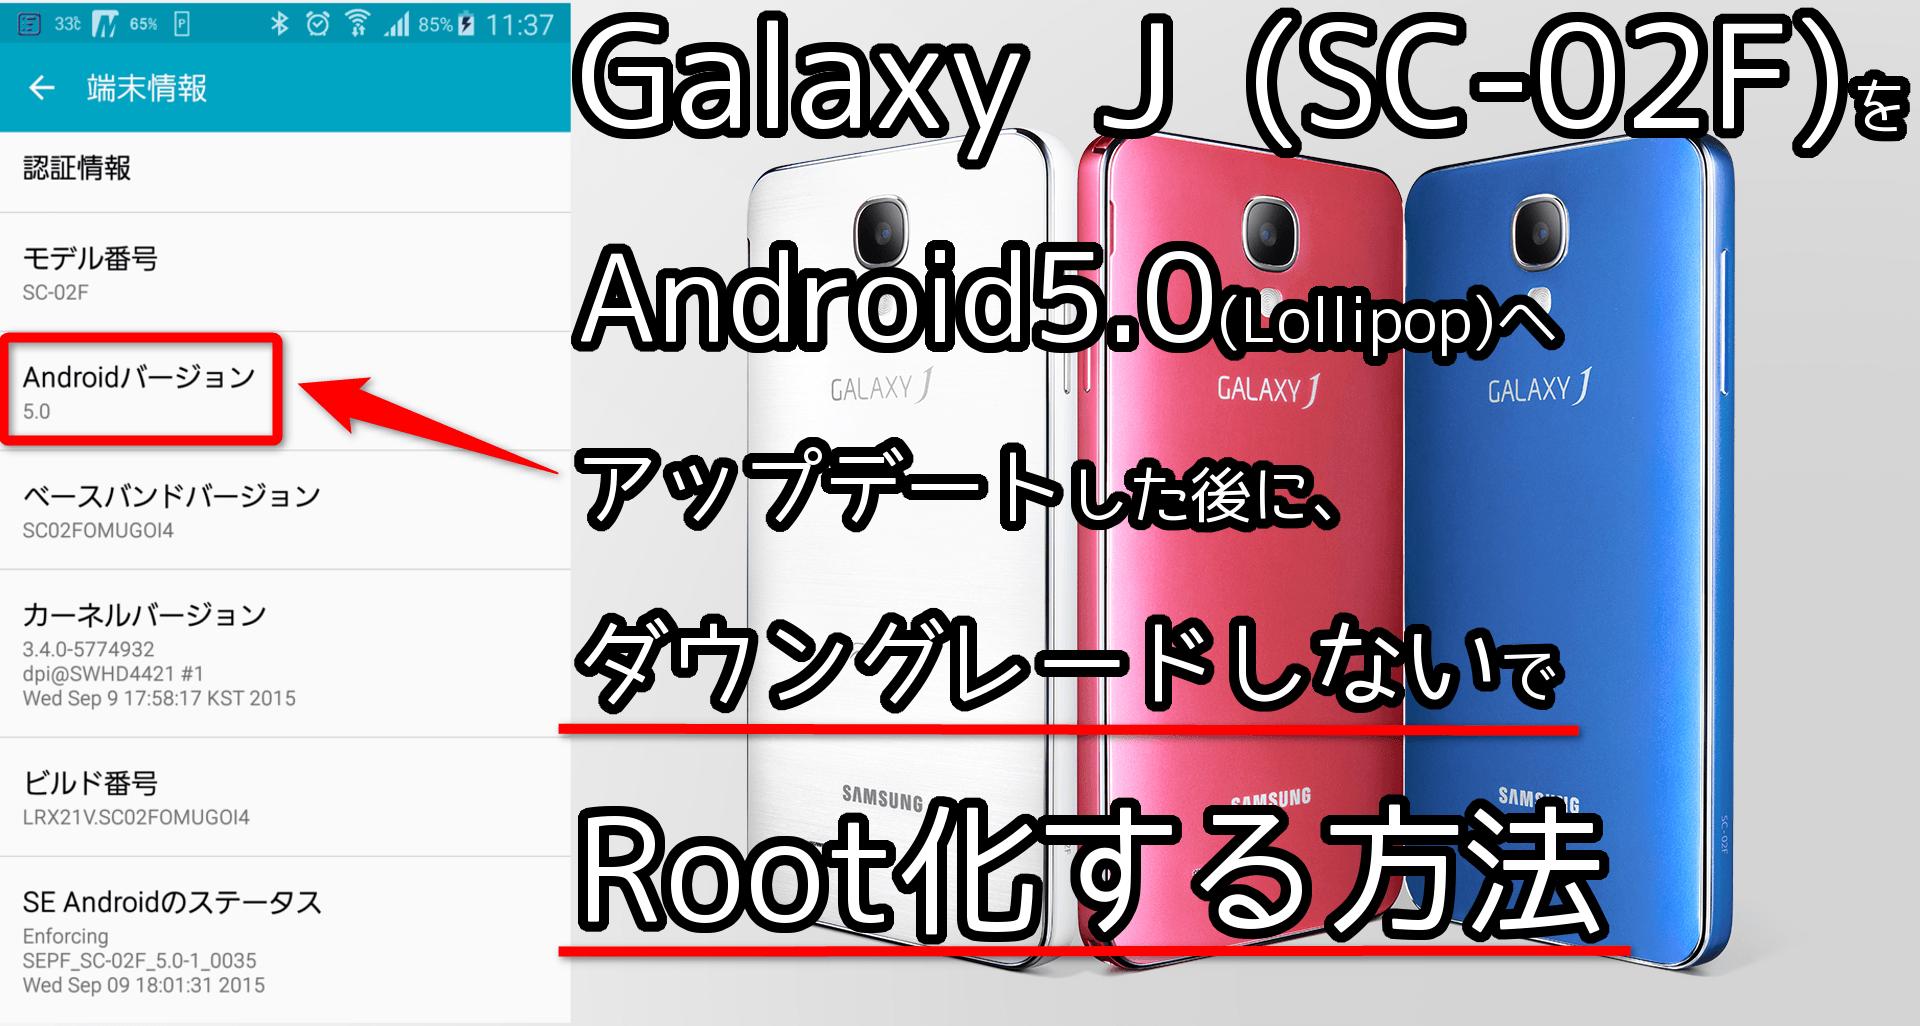 galaxy-j_sc-02f_アイキャッチ-min